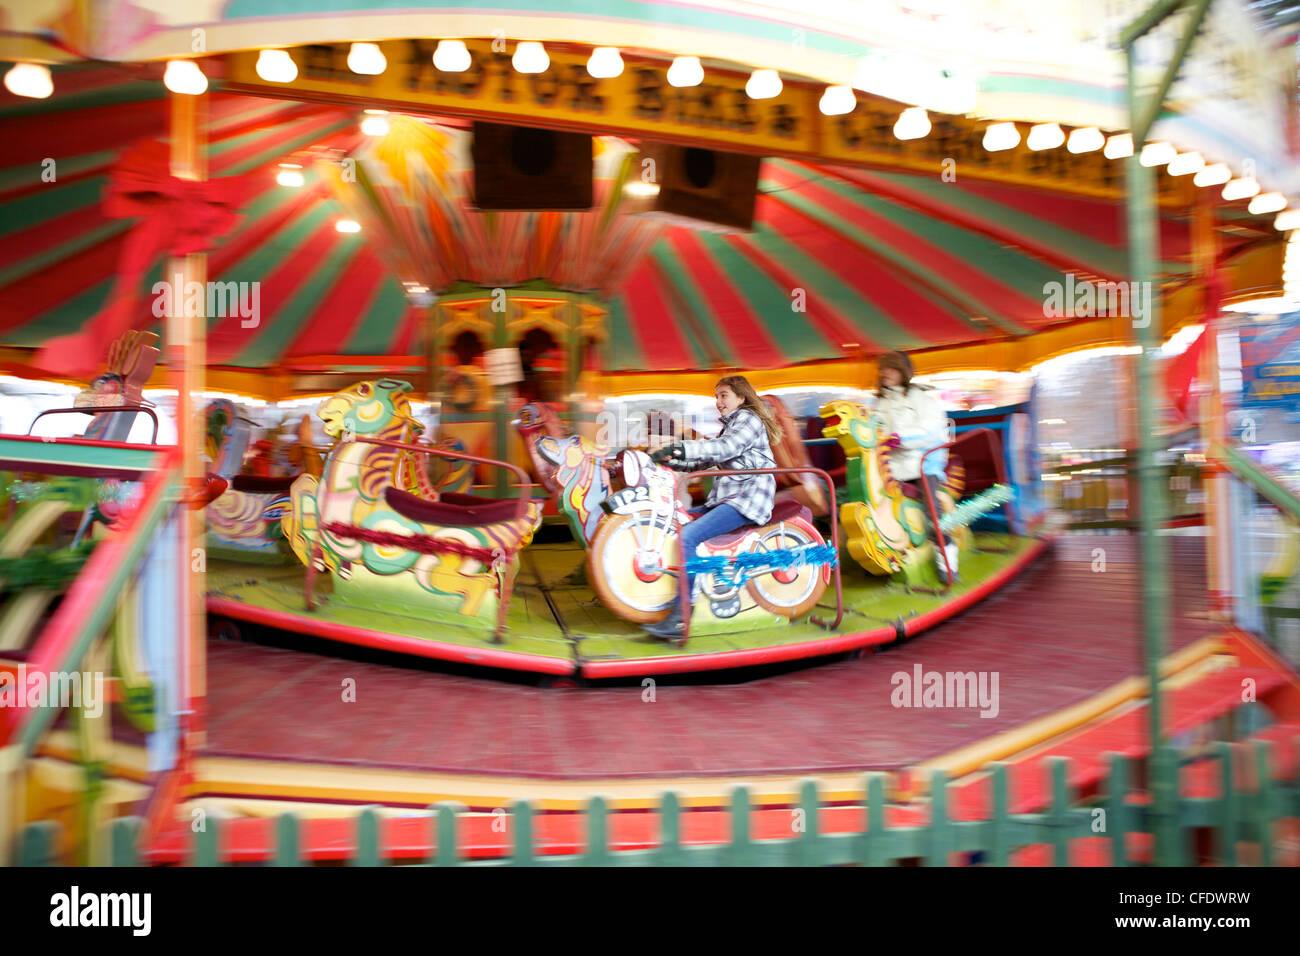 Kinder reiten ein Karussell, Hyde Park, London, England, Vereinigtes Königreich, Europa (Bewegungsunschärfe) Stockbild